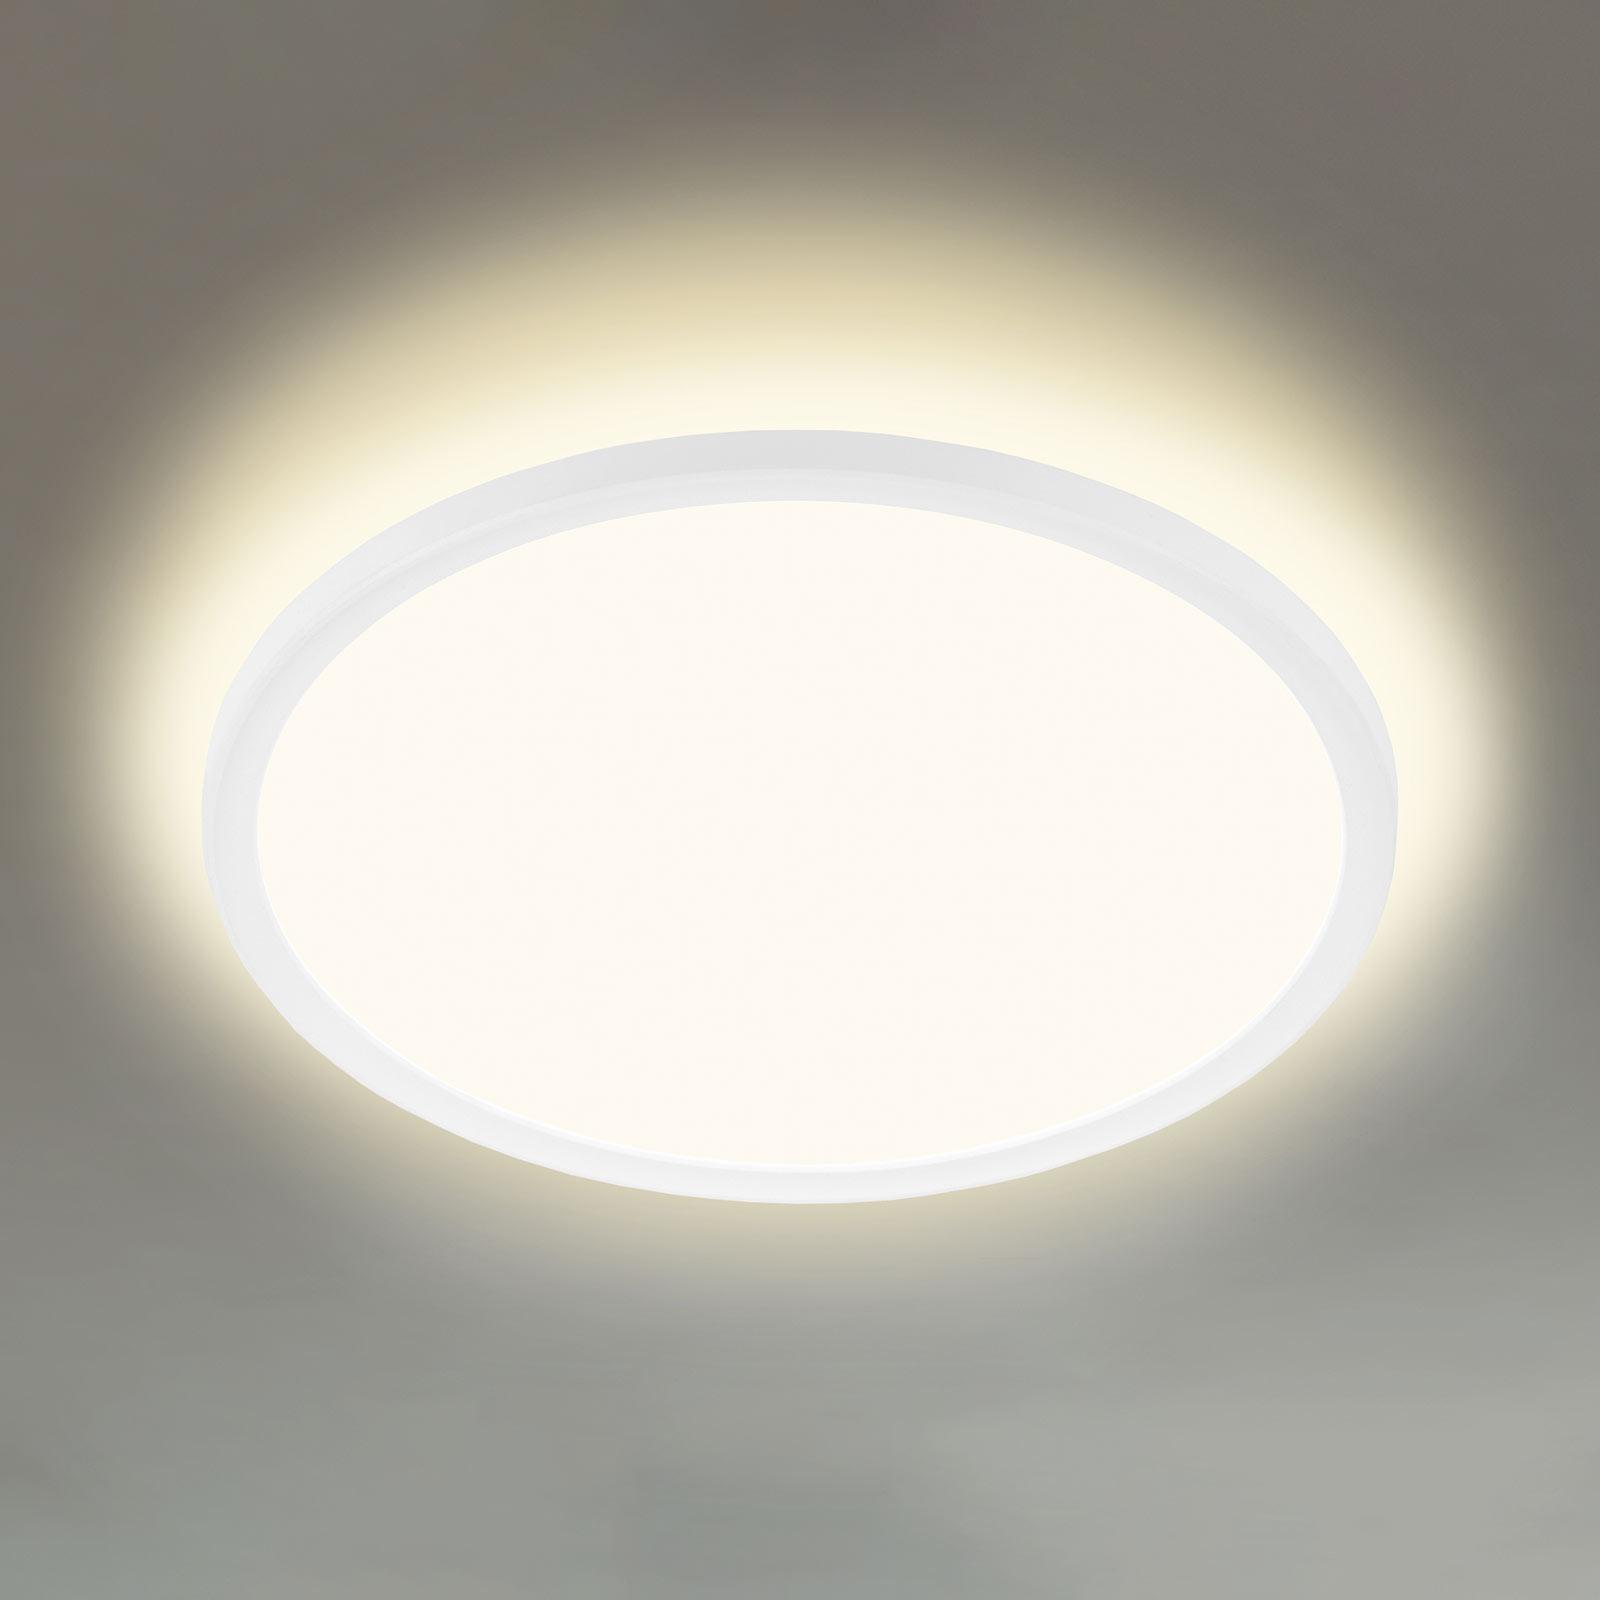 LED-taklampe 7155/7157, rund, 29,3 cm